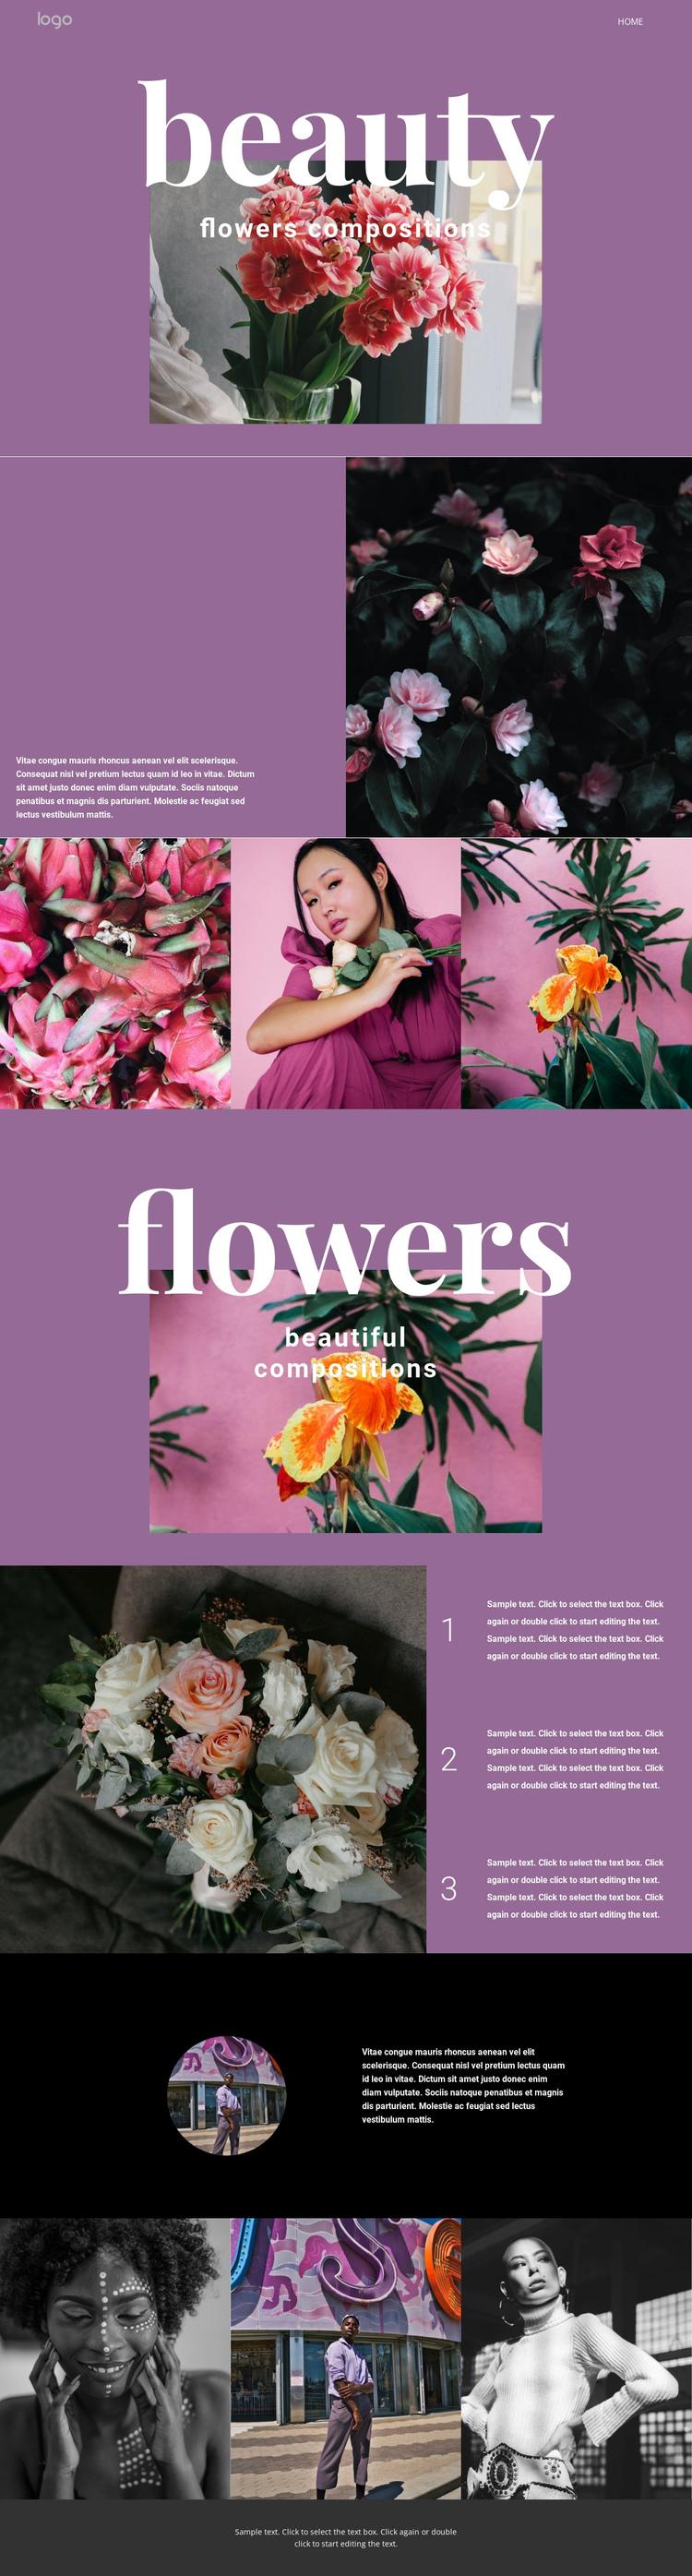 Flower salon Website Builder Software